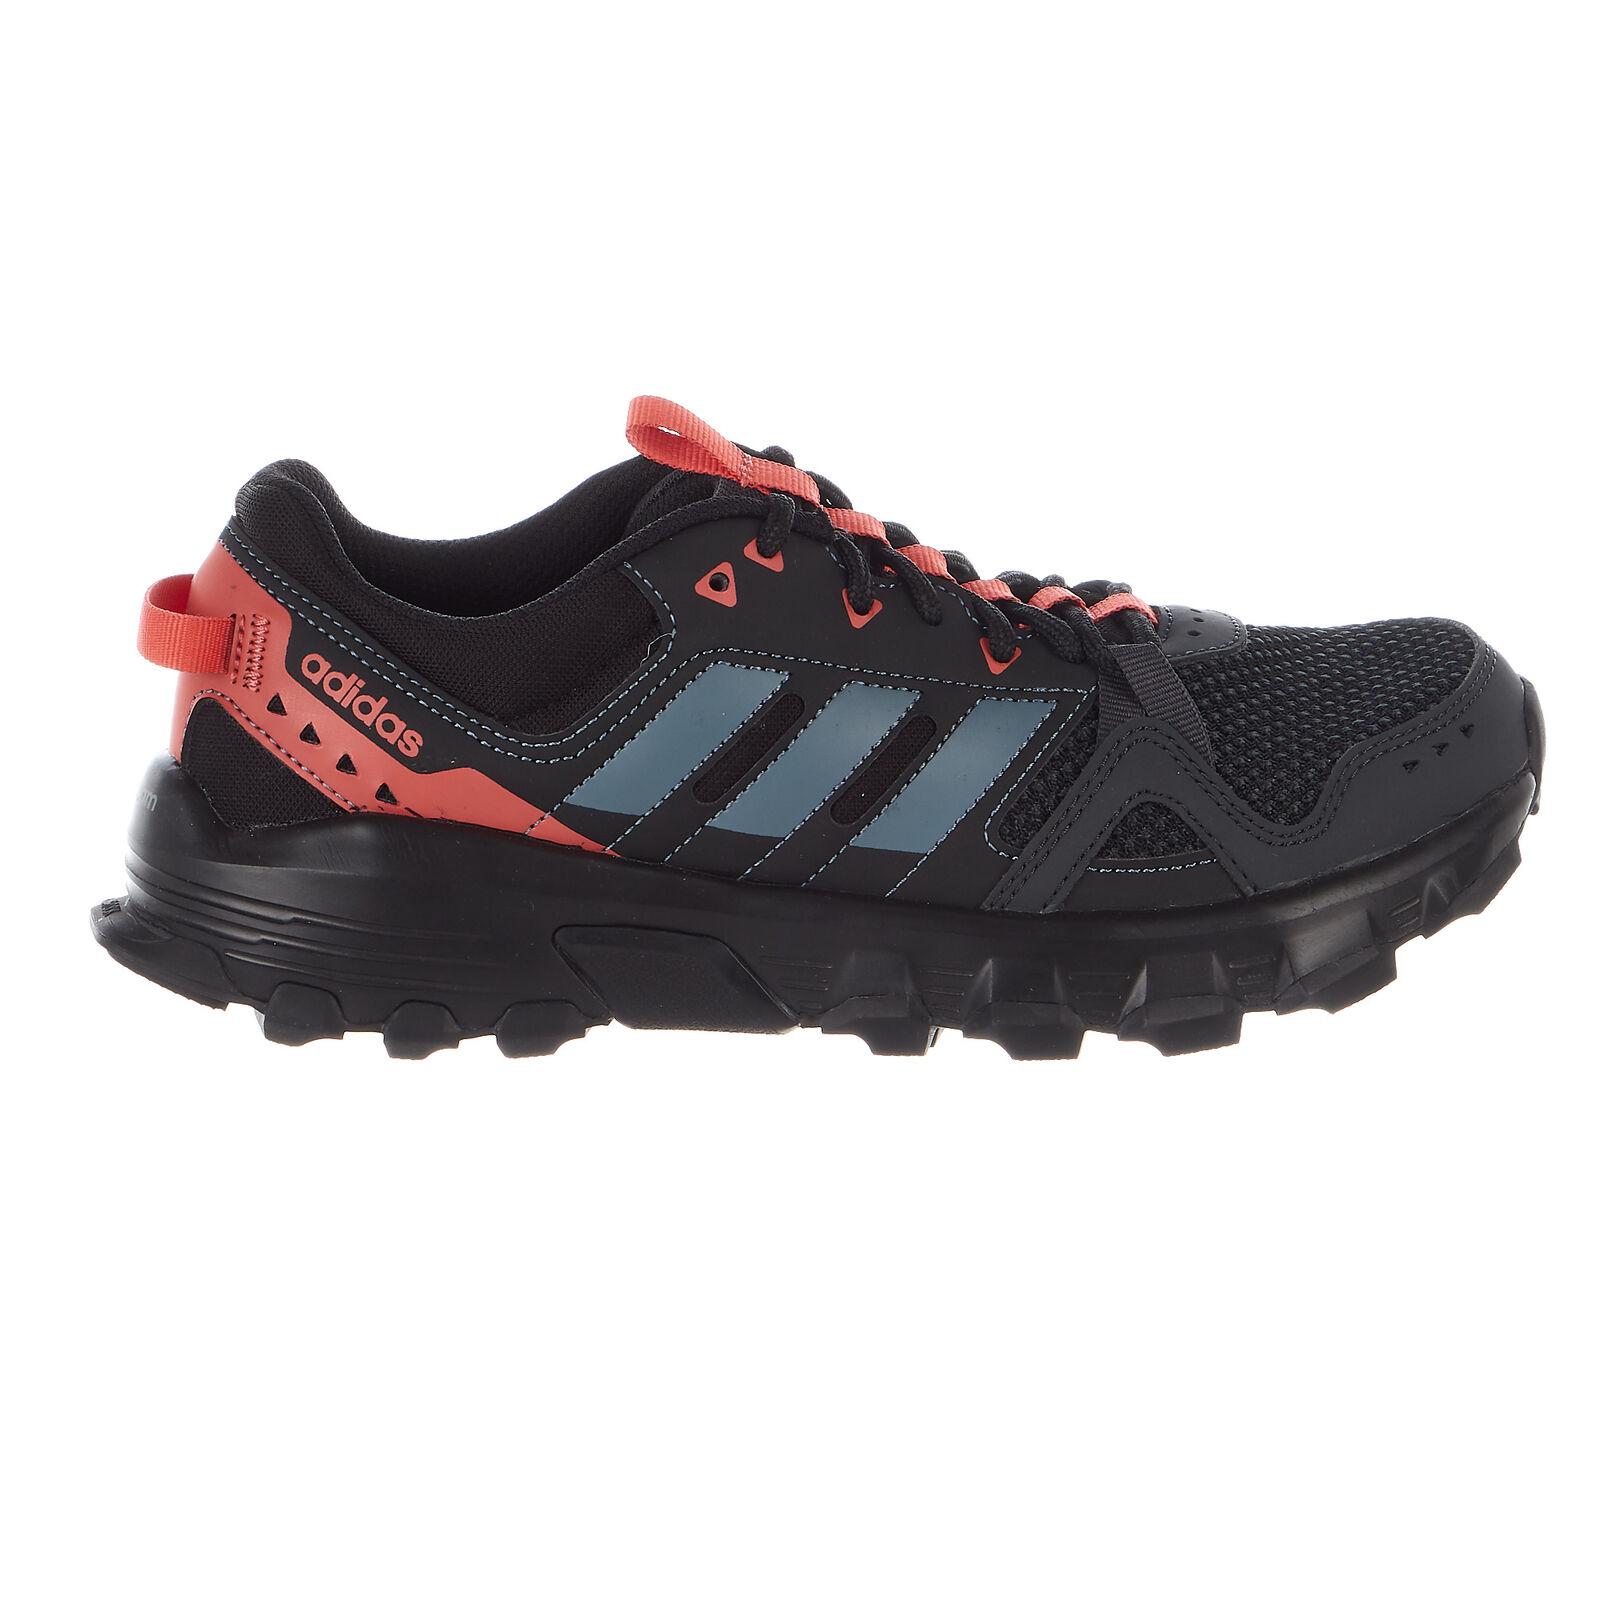 Adidas Trail rockadia Trail Adidas Corriendo Zapatos - Mujer 3633f3